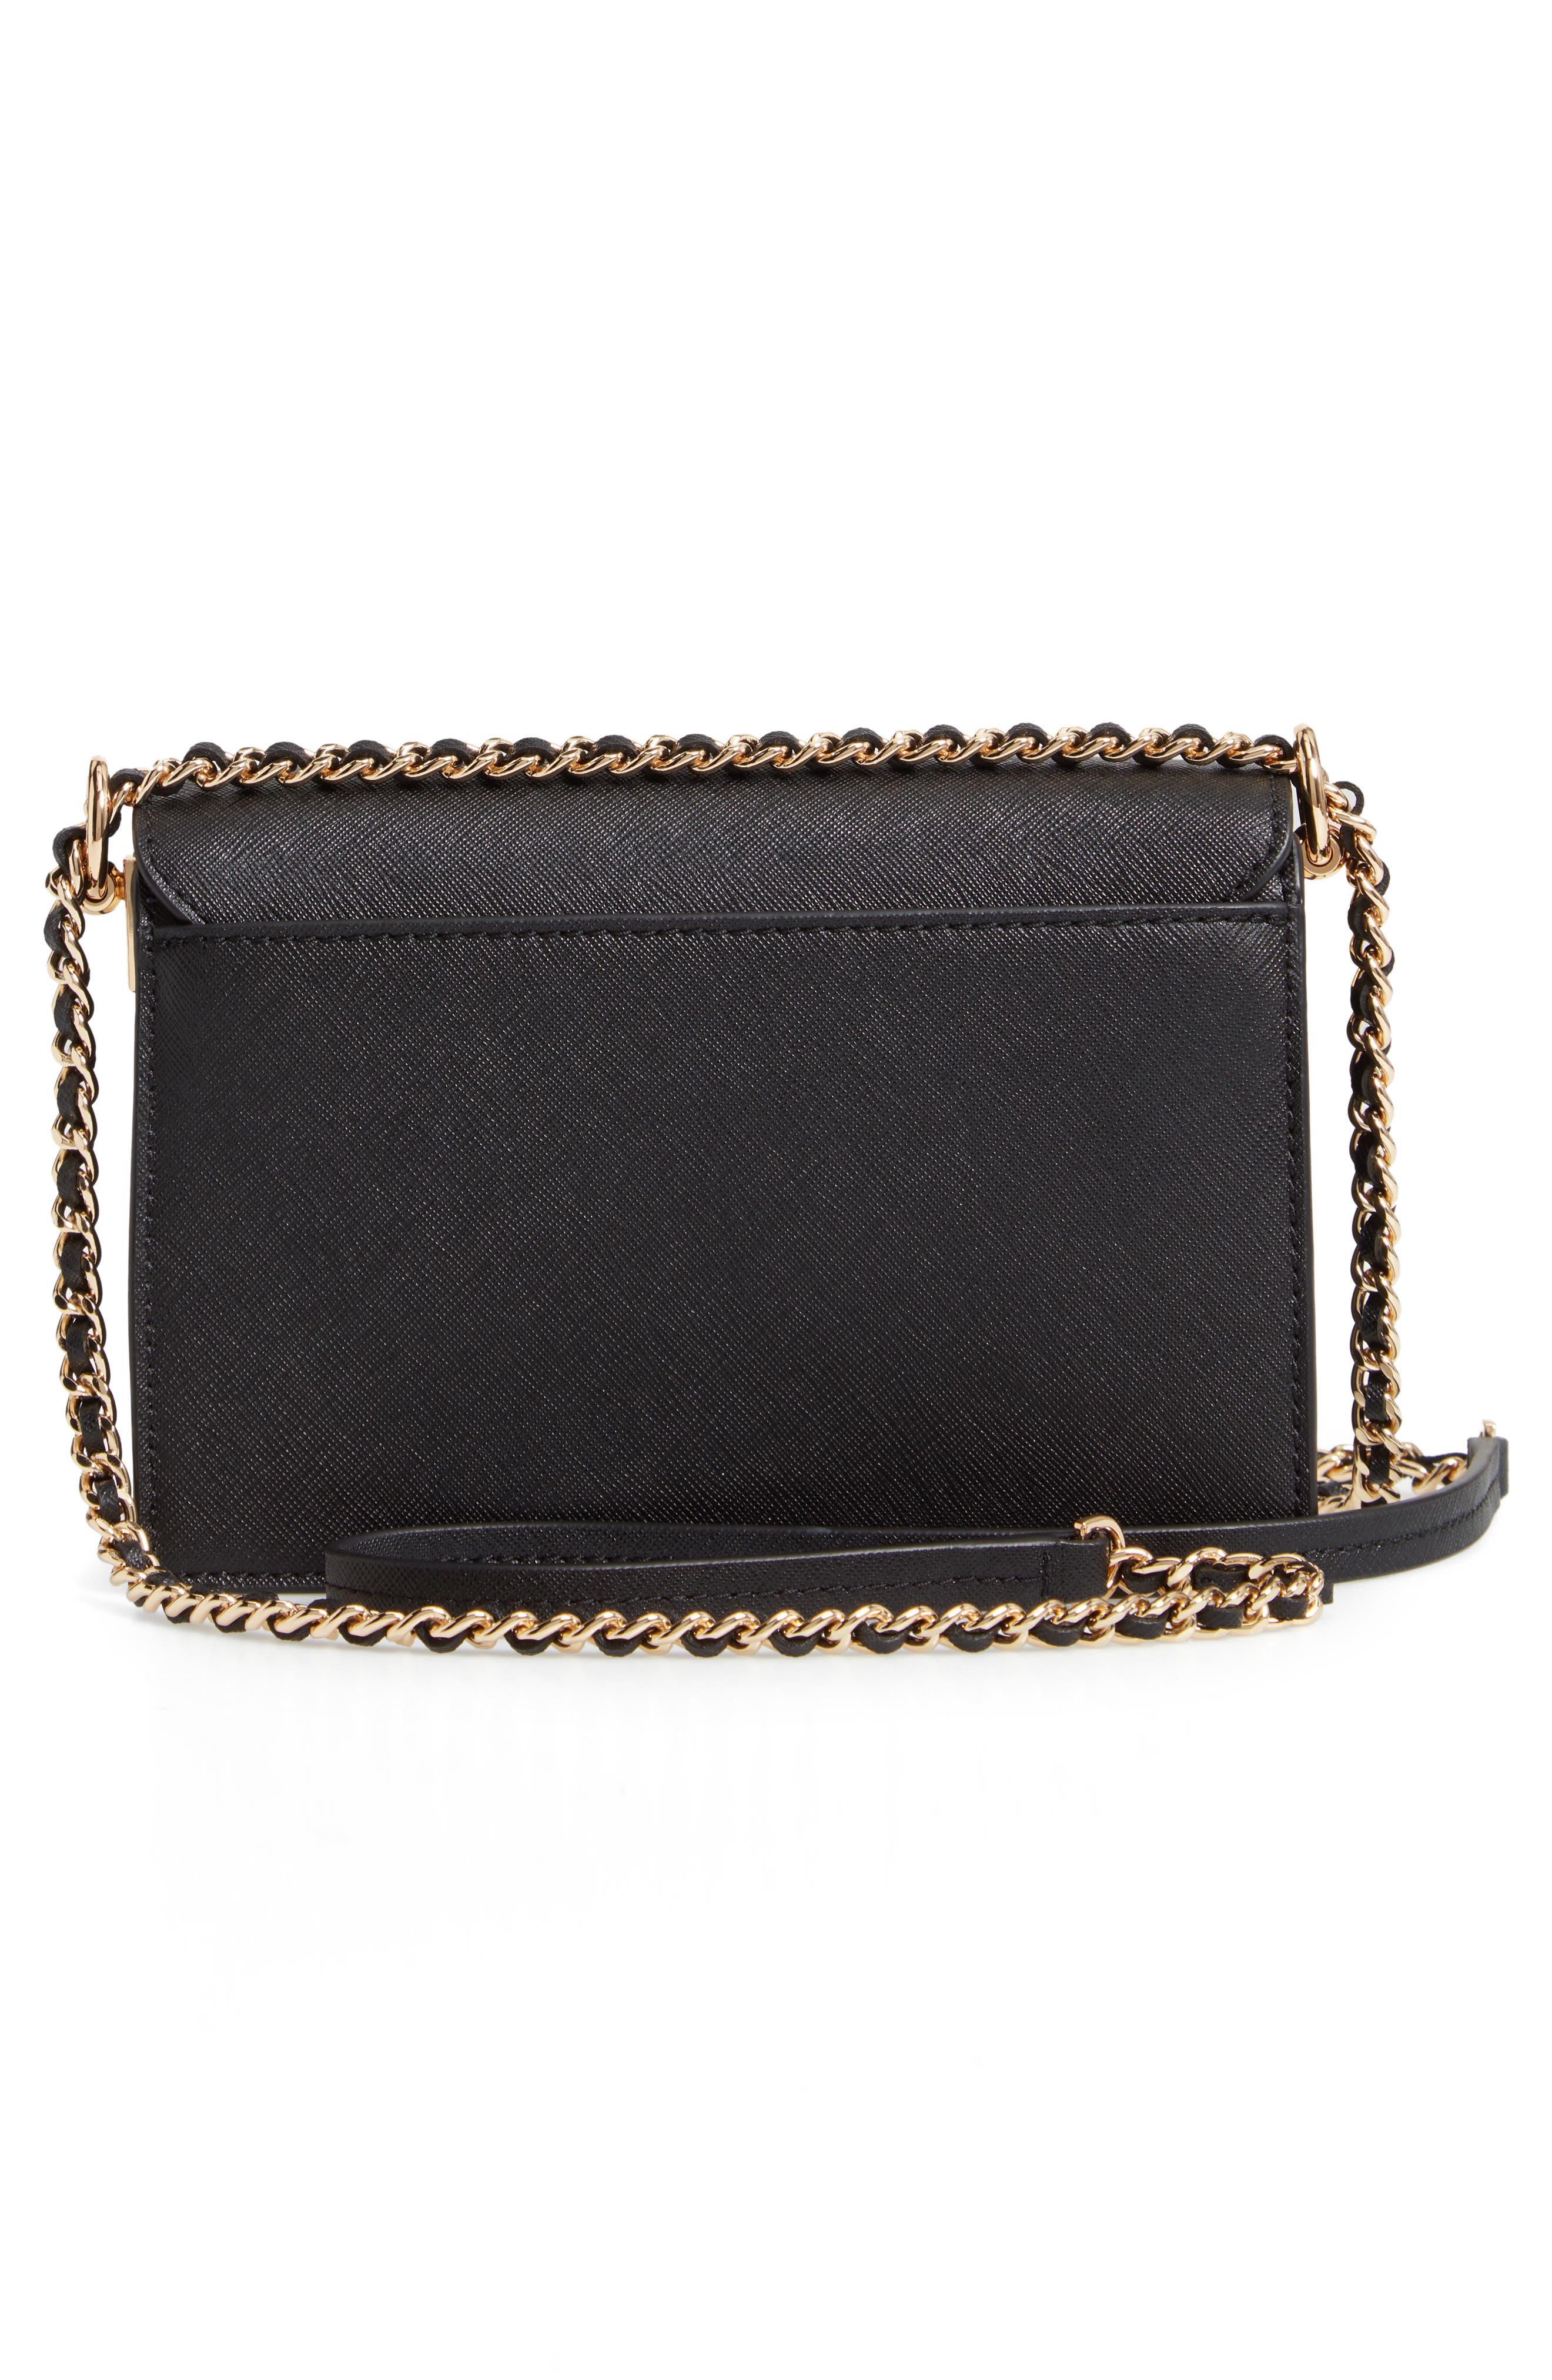 Mini Robinson Convertible Leather Shoulder Bag,                             Alternate thumbnail 3, color,                             BLACK